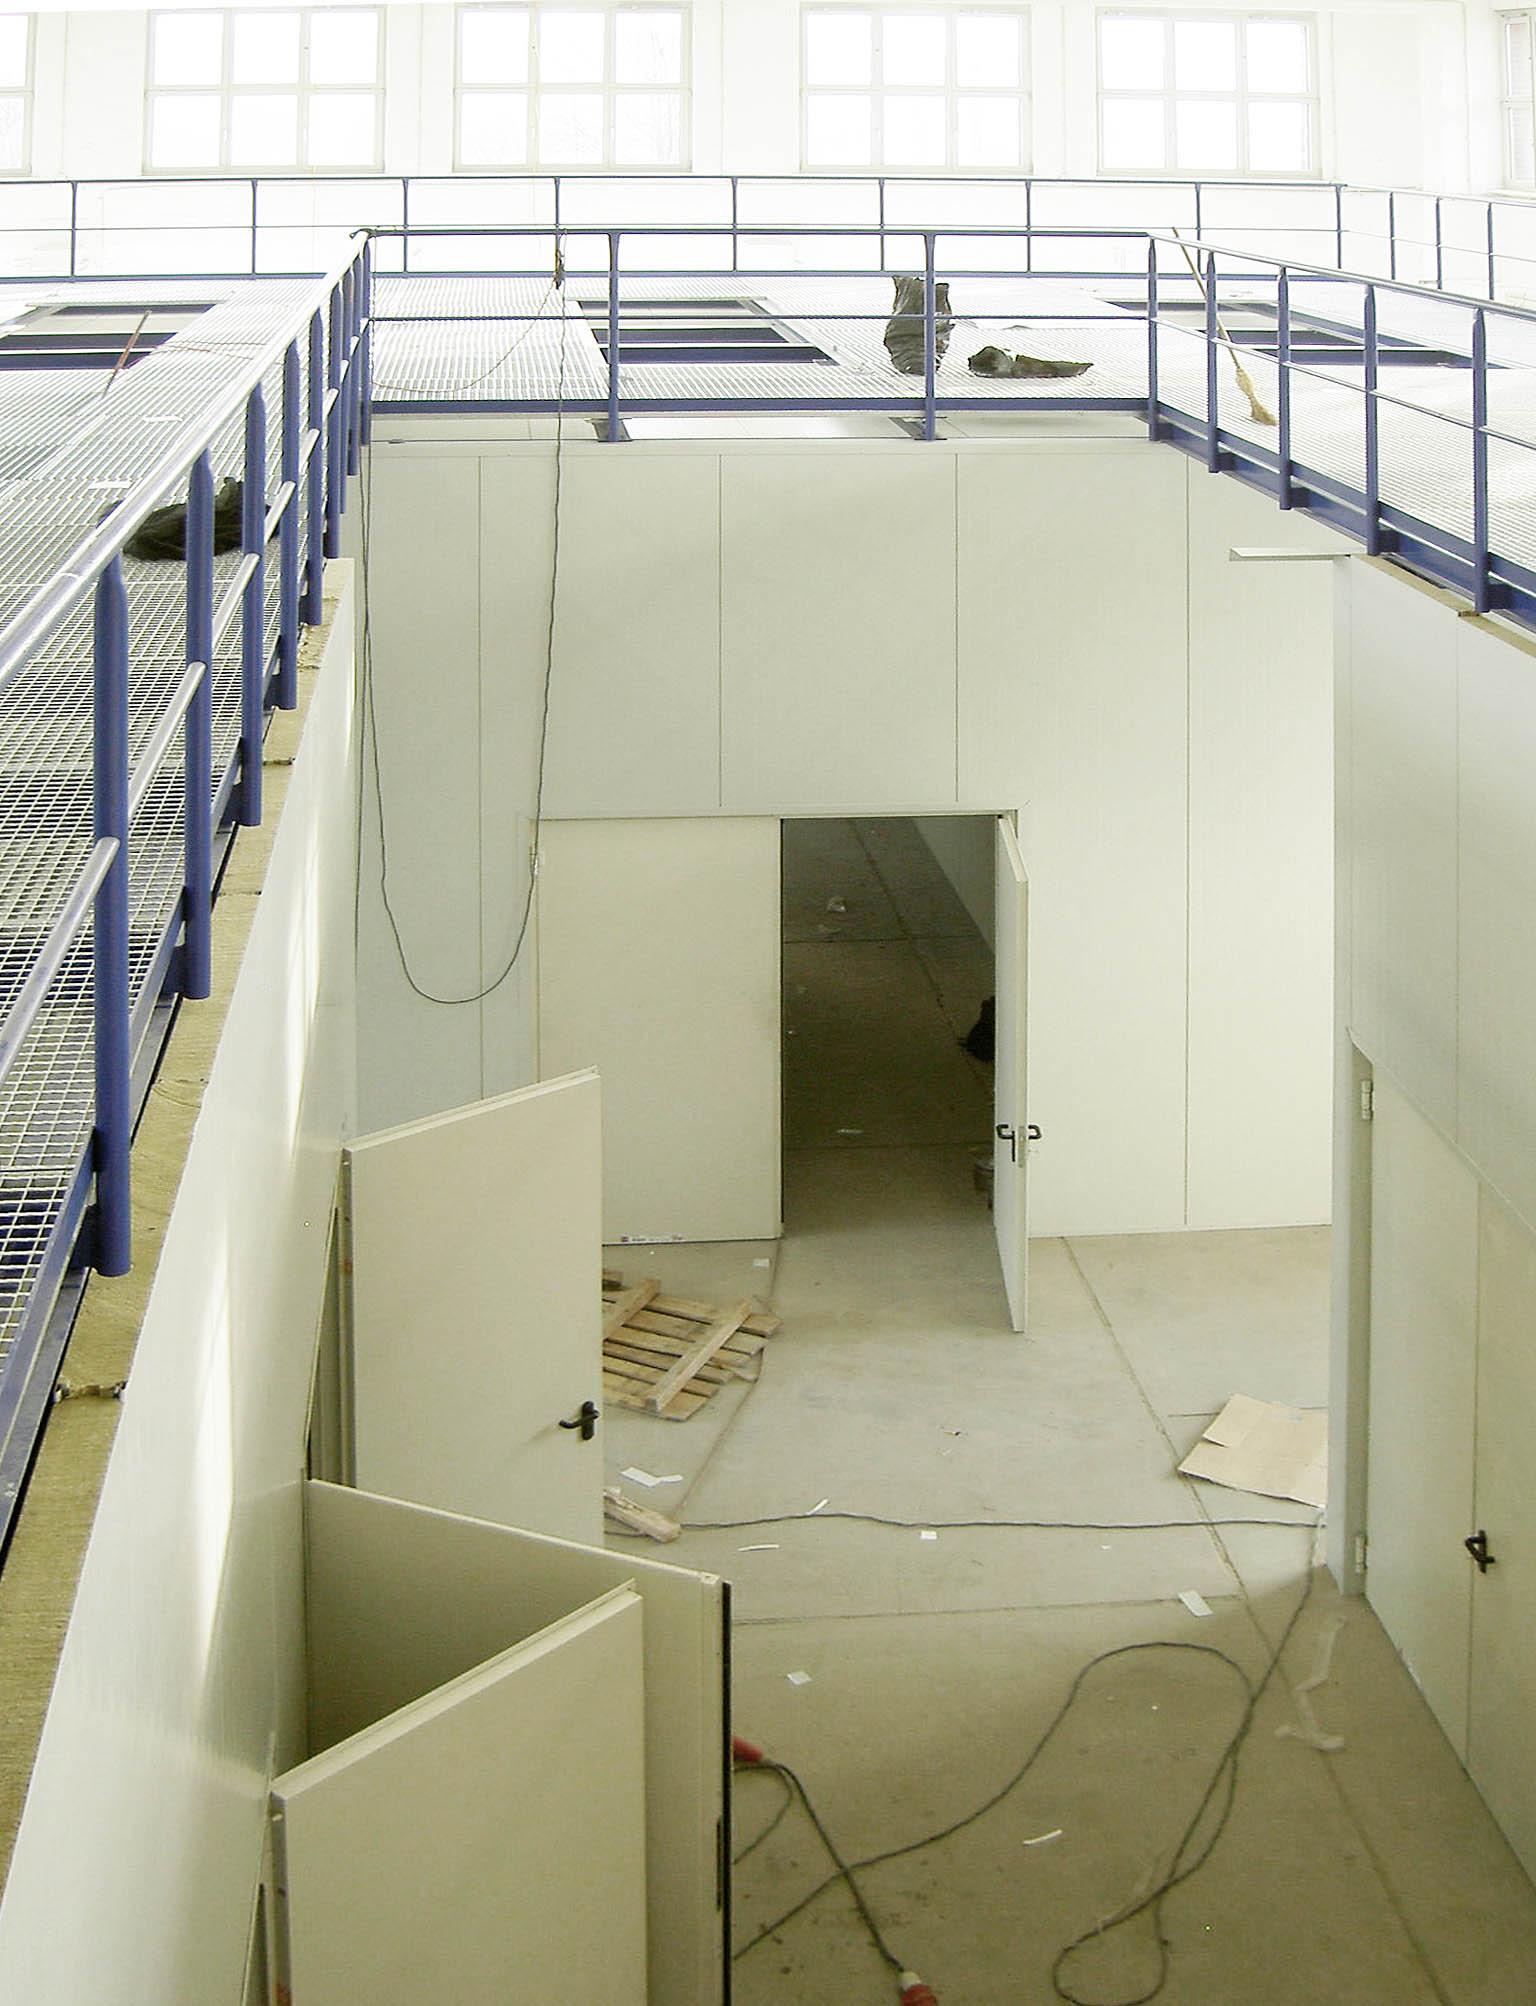 Inneraum Gebäude 14